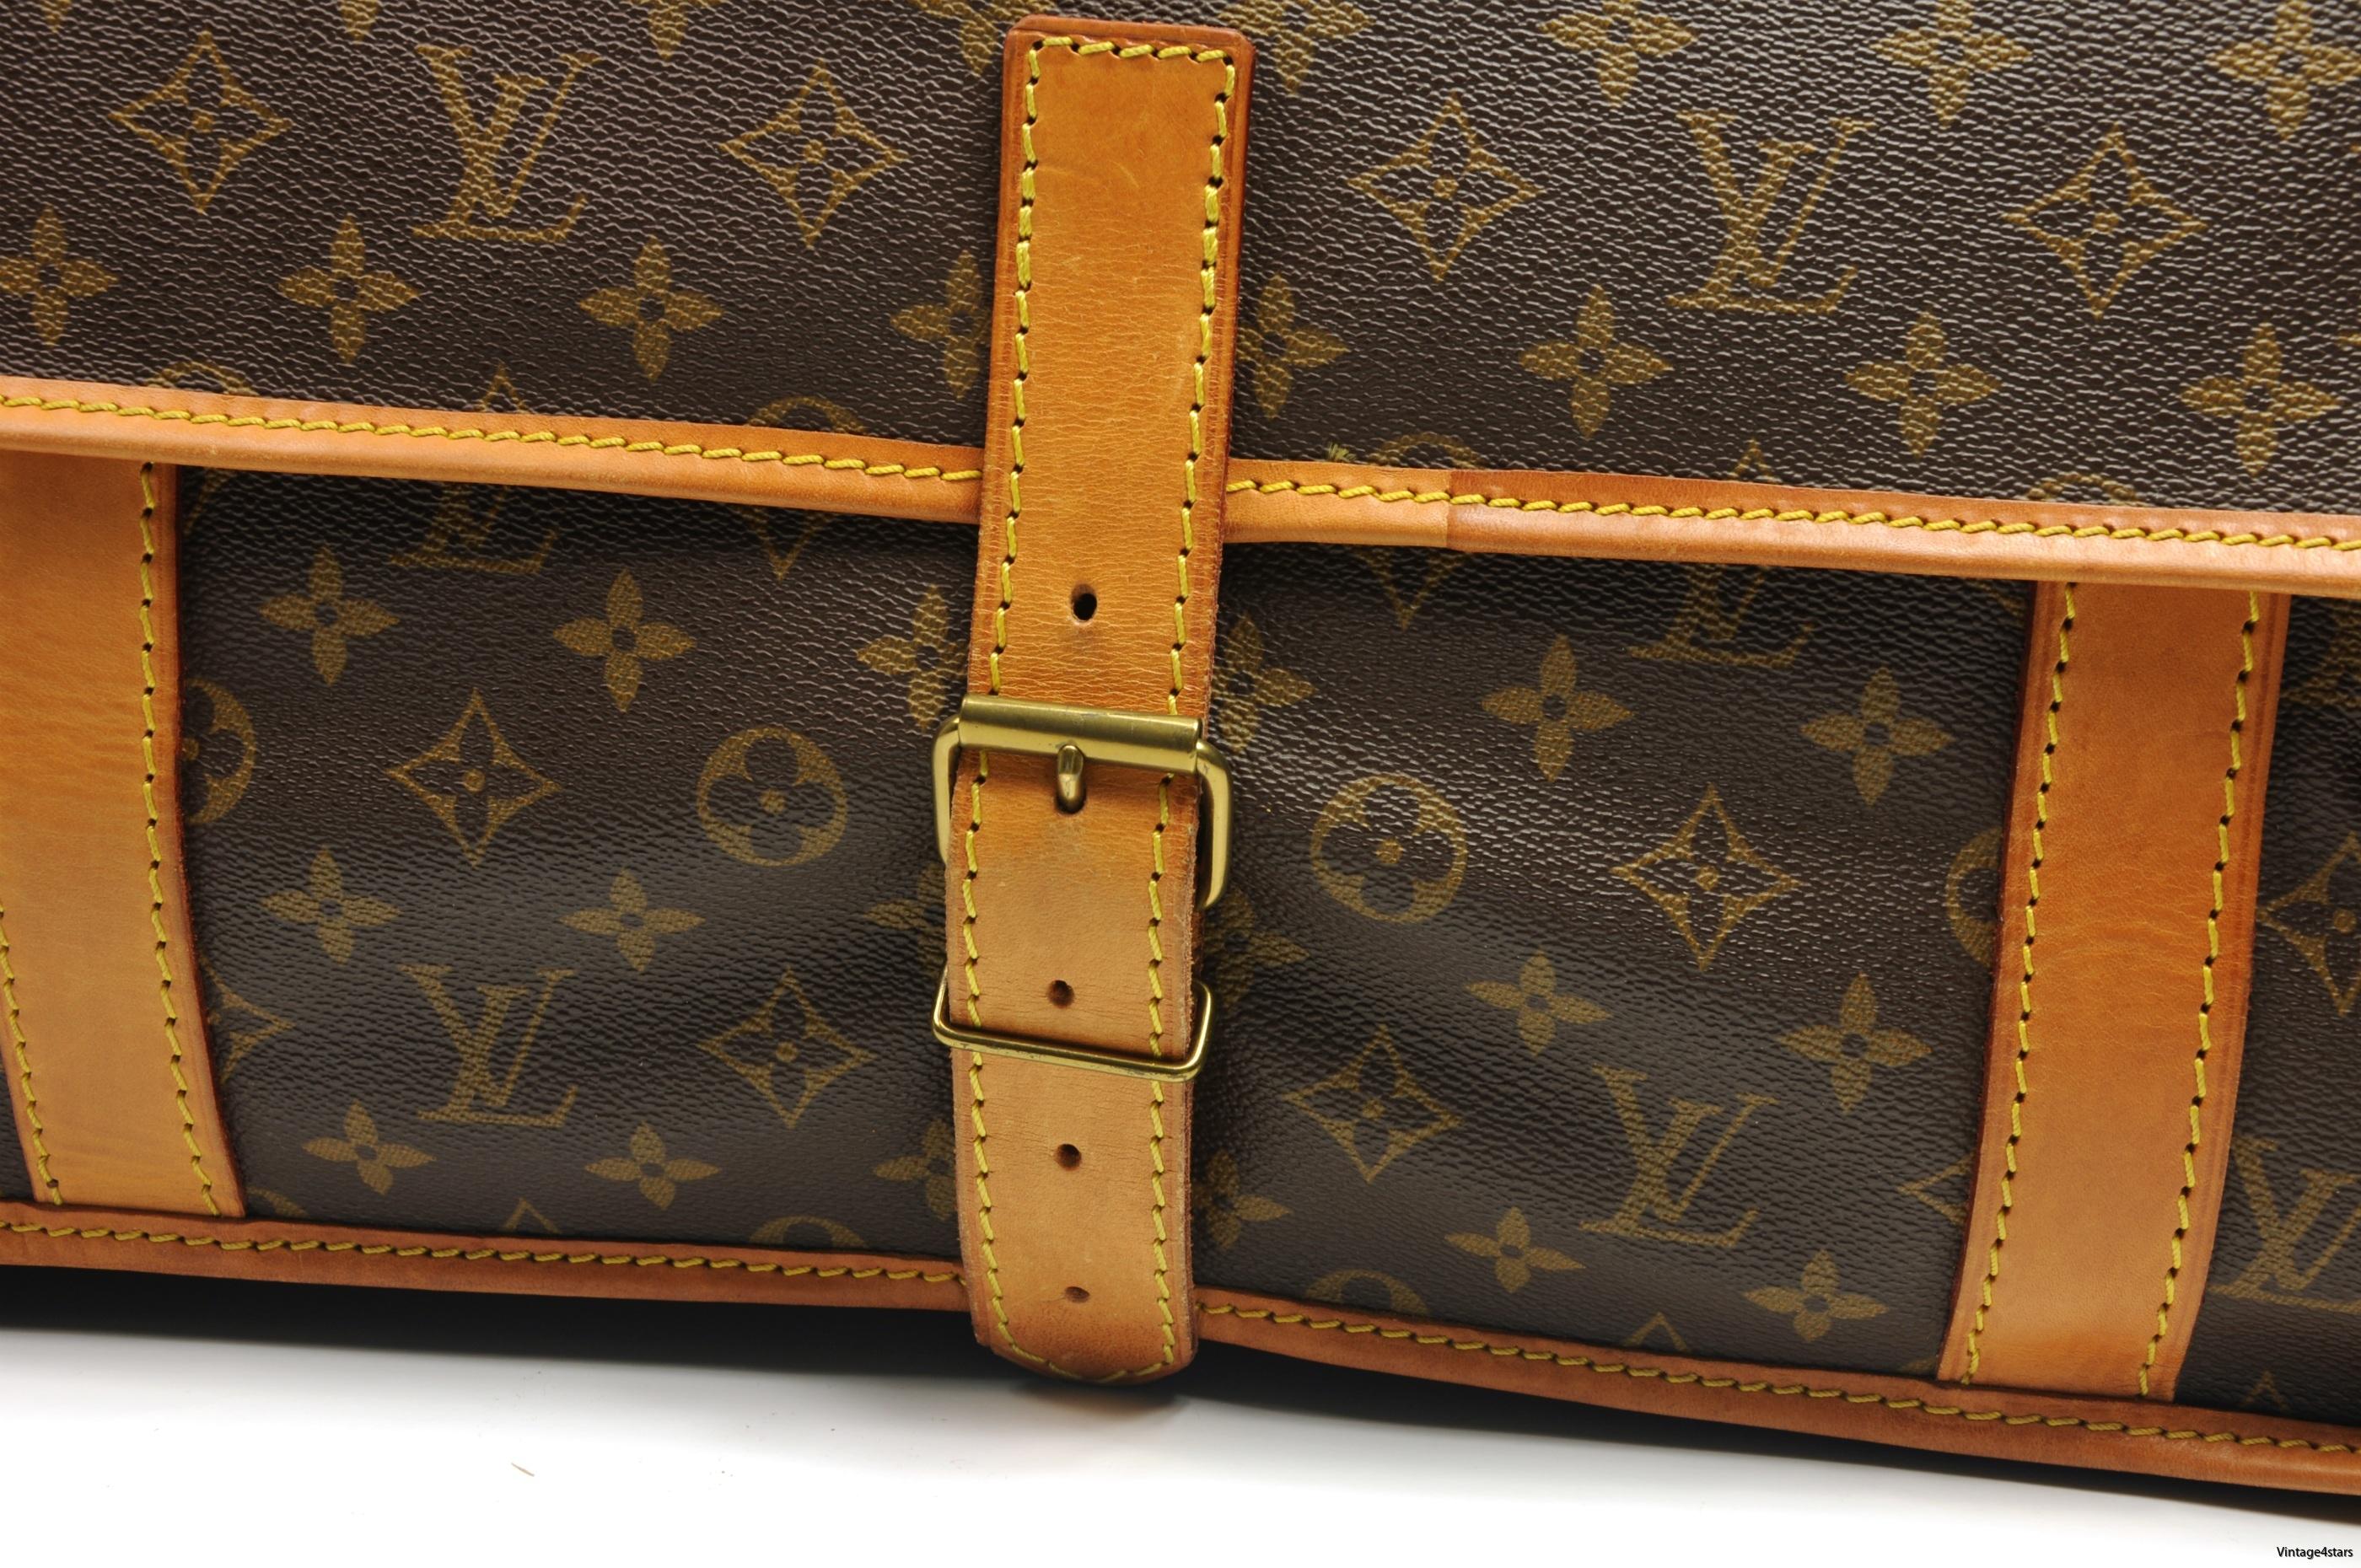 Louis Vuitton Sac Chasse Kleber 09